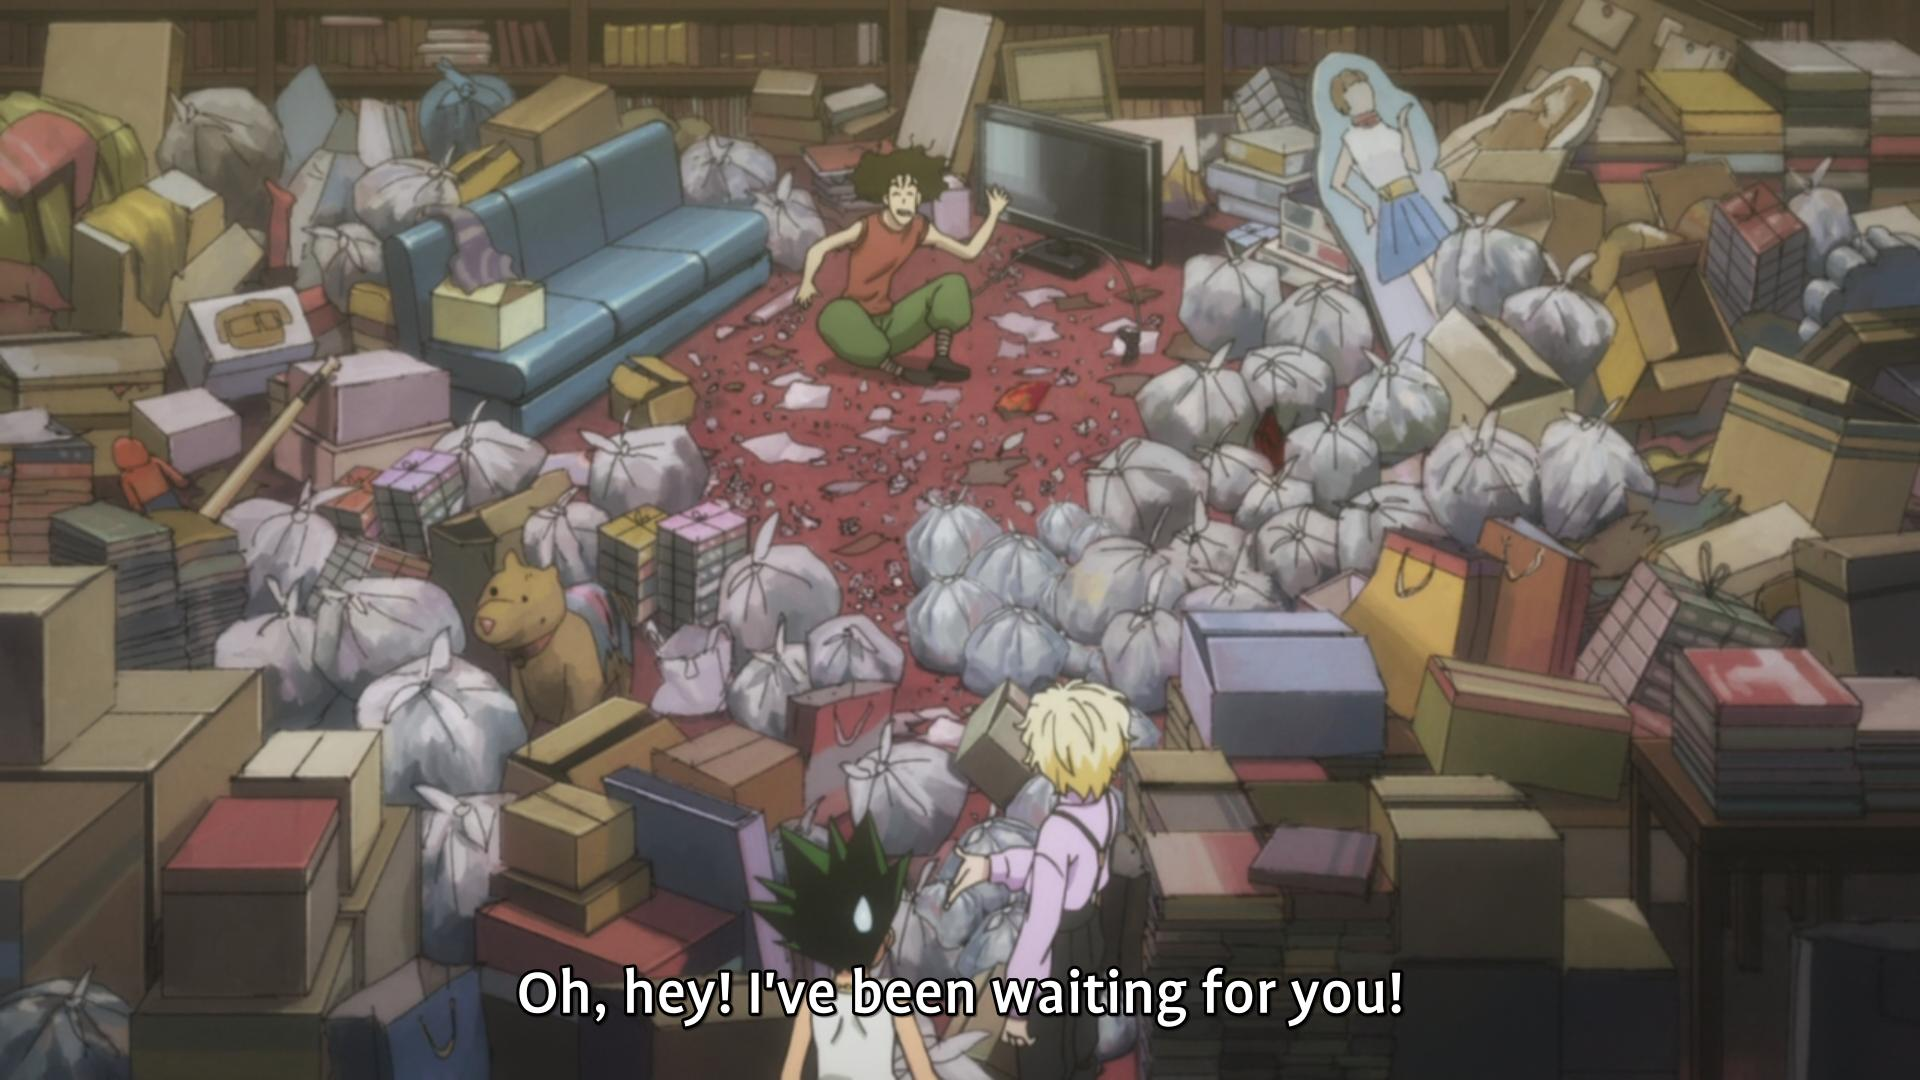 Anime Fantasy Wallpaper Hunter X Hunter Is Dwun Wdwune Based On Yoshihiro